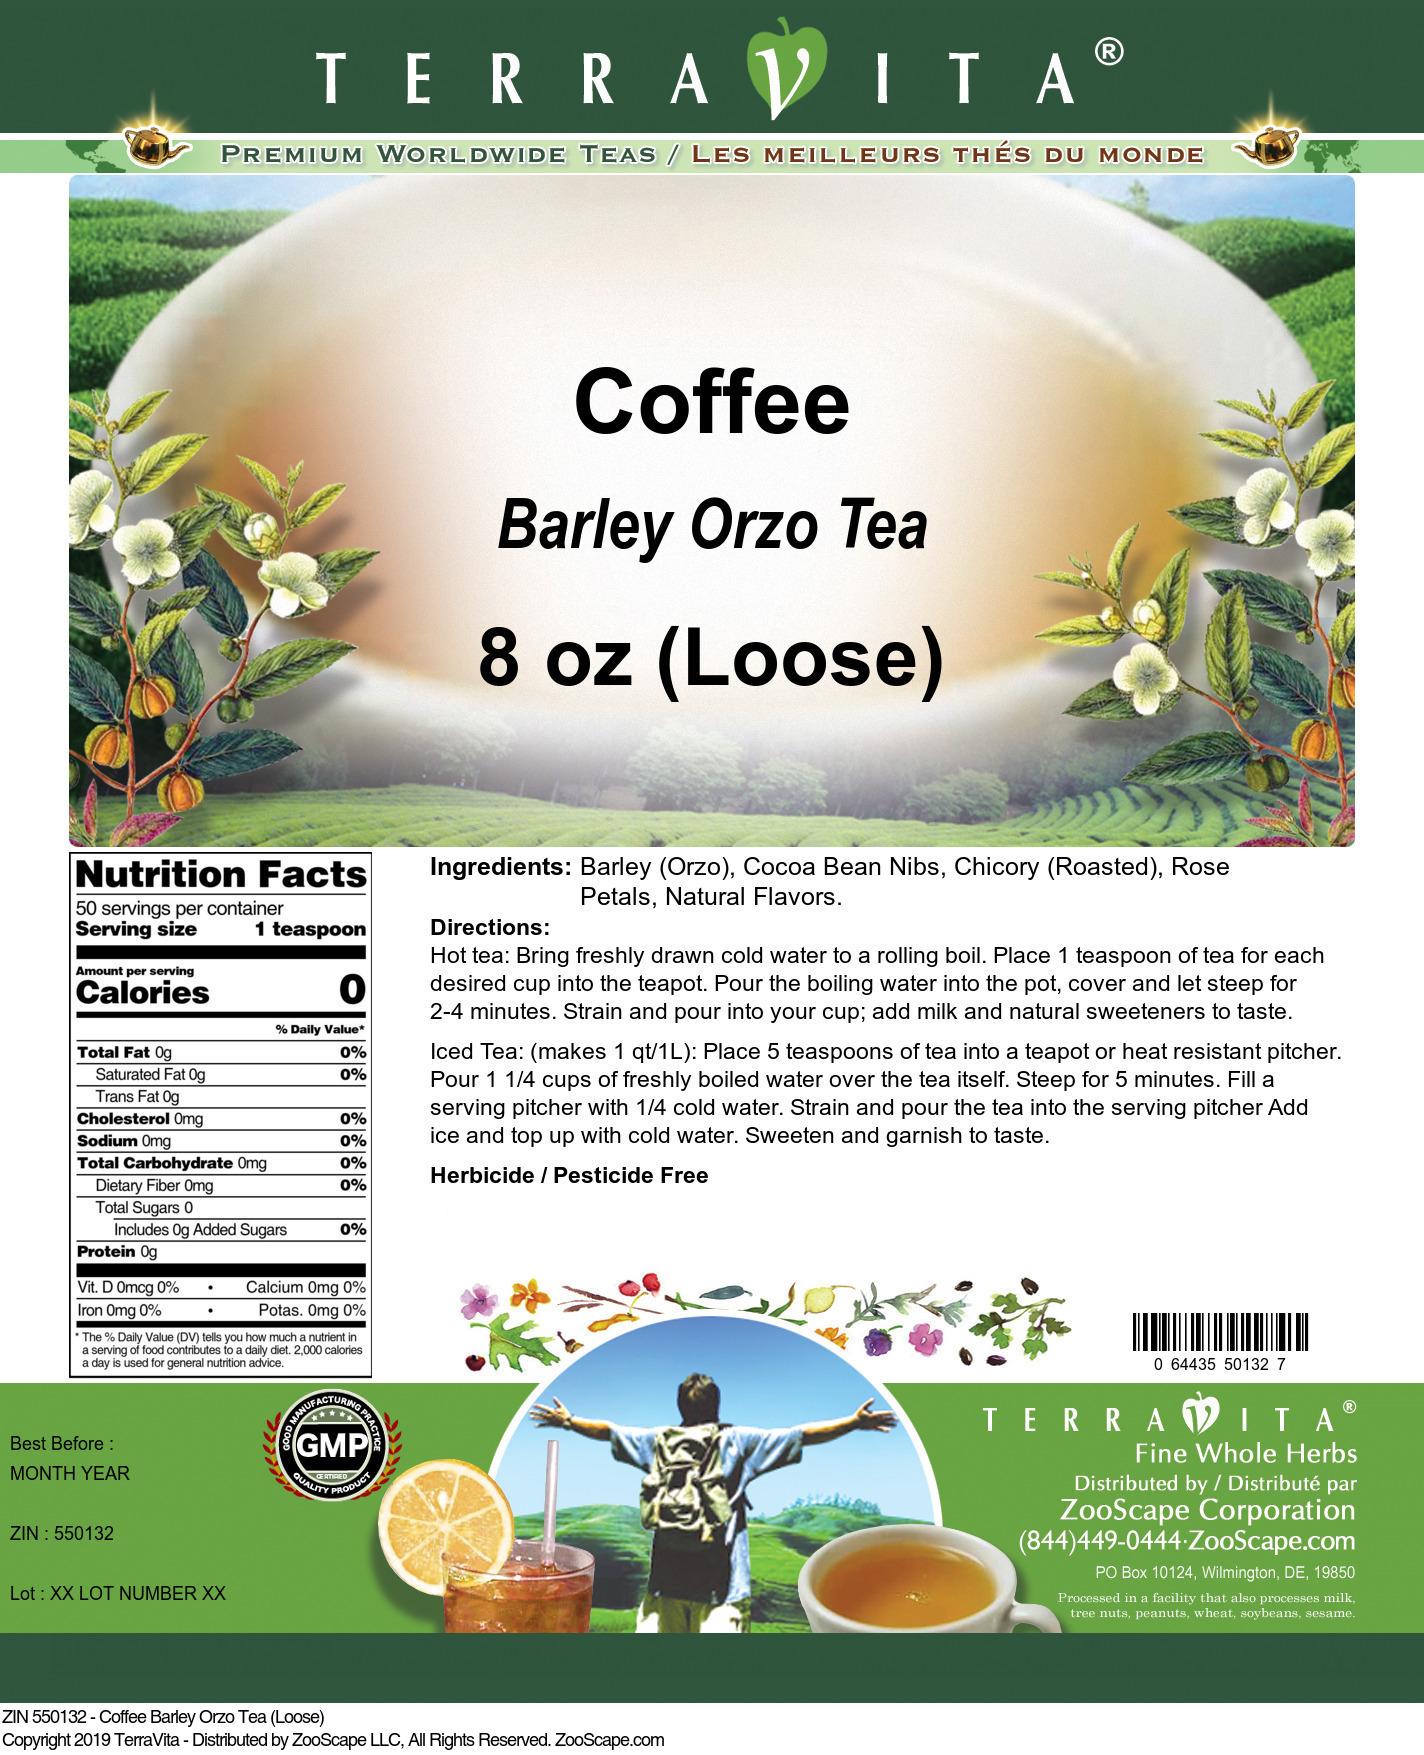 Coffee Barley Orzo